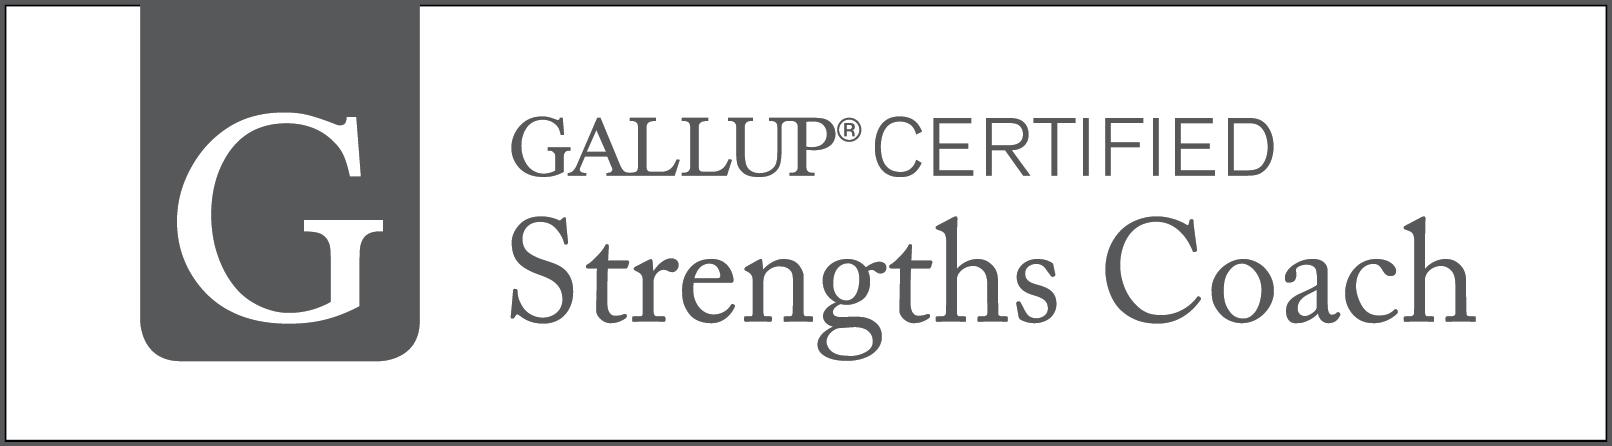 gallup-coach-logo-2x.png